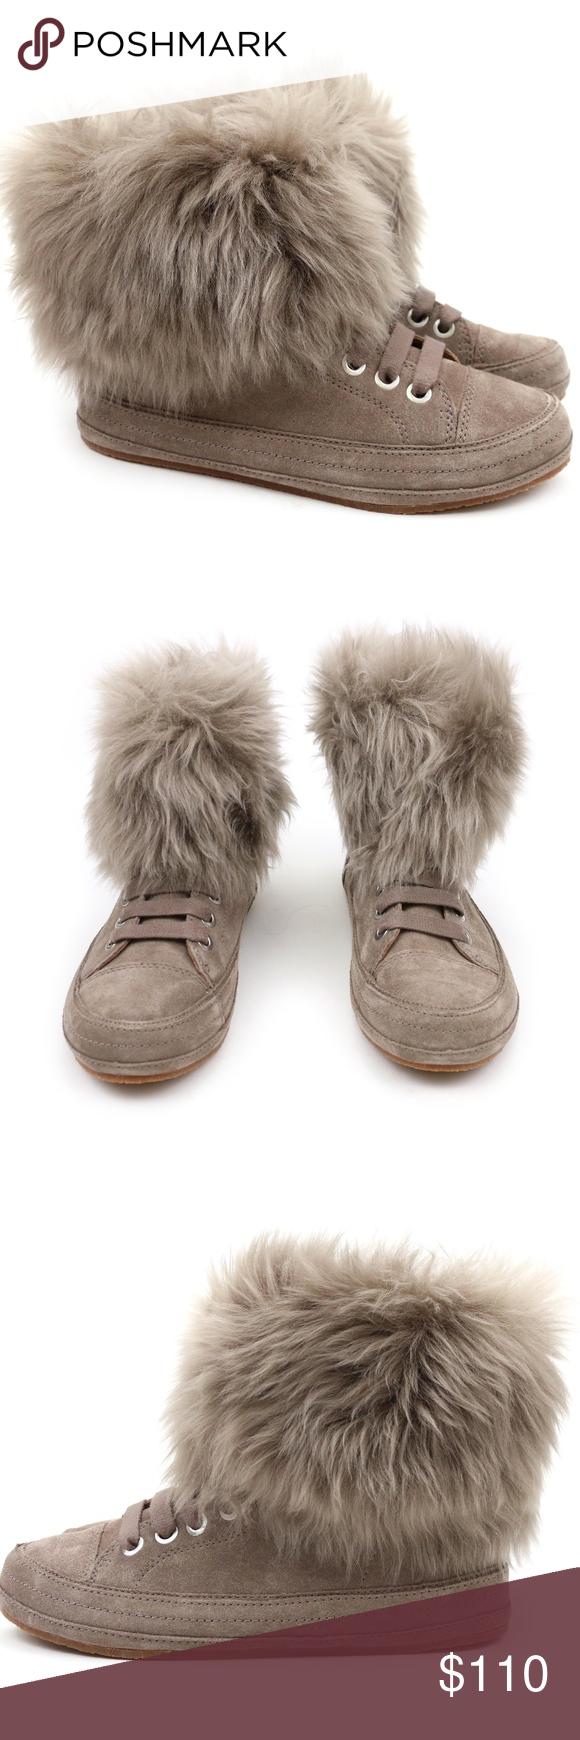 af0a591c49f UGG Australia Antoine Fur Slate Sheepskin Sneakers This fresh and ...